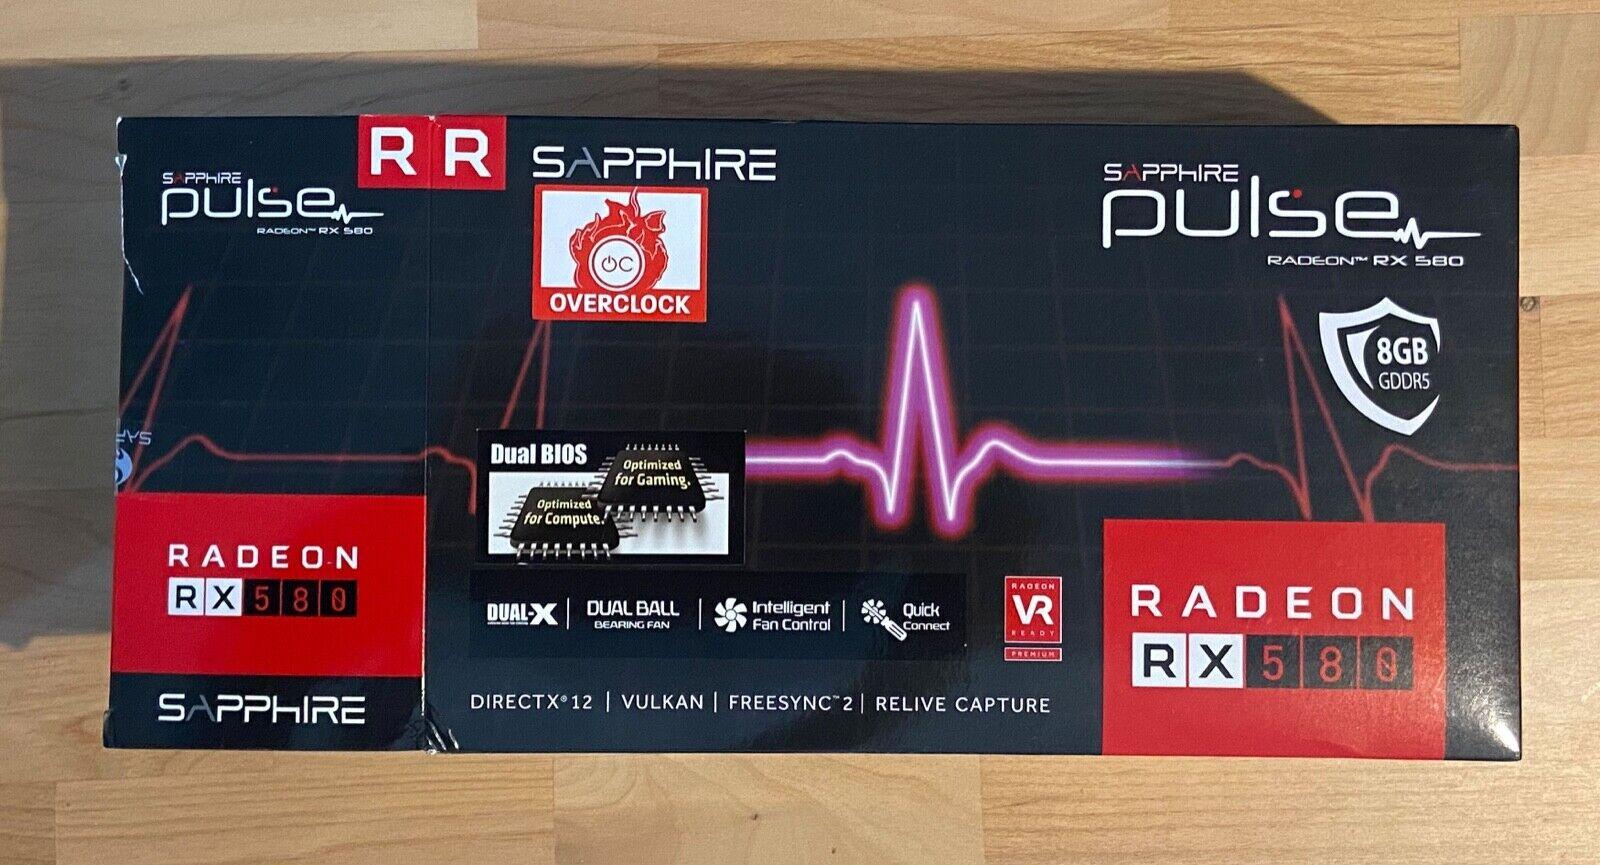 SAPPHIRE Pulse Radeon RX 580 8gb Gddr5 graphics card.